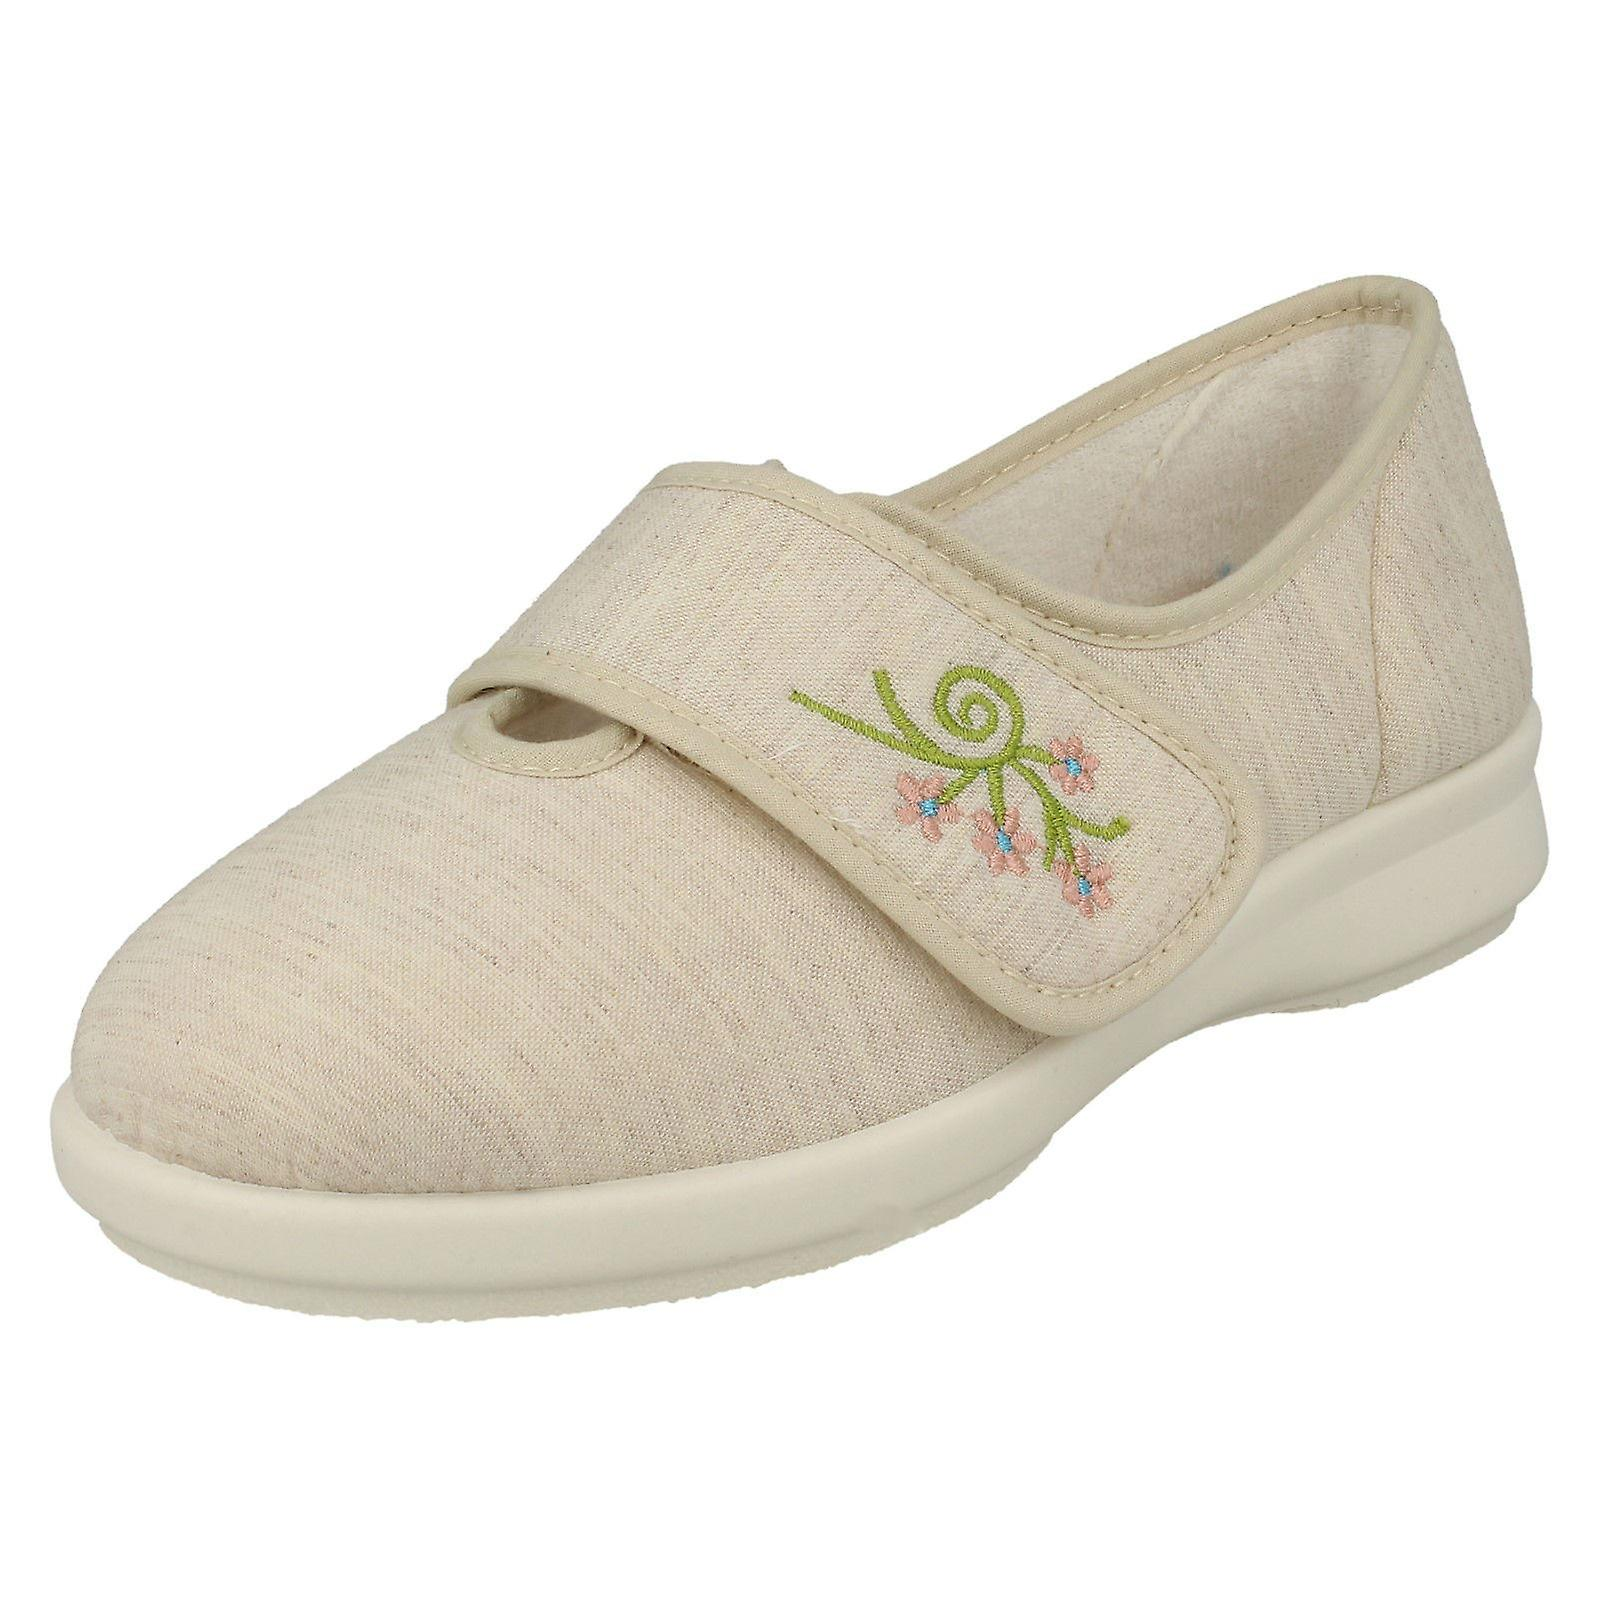 Einfach B Damen Schuhe Sandy